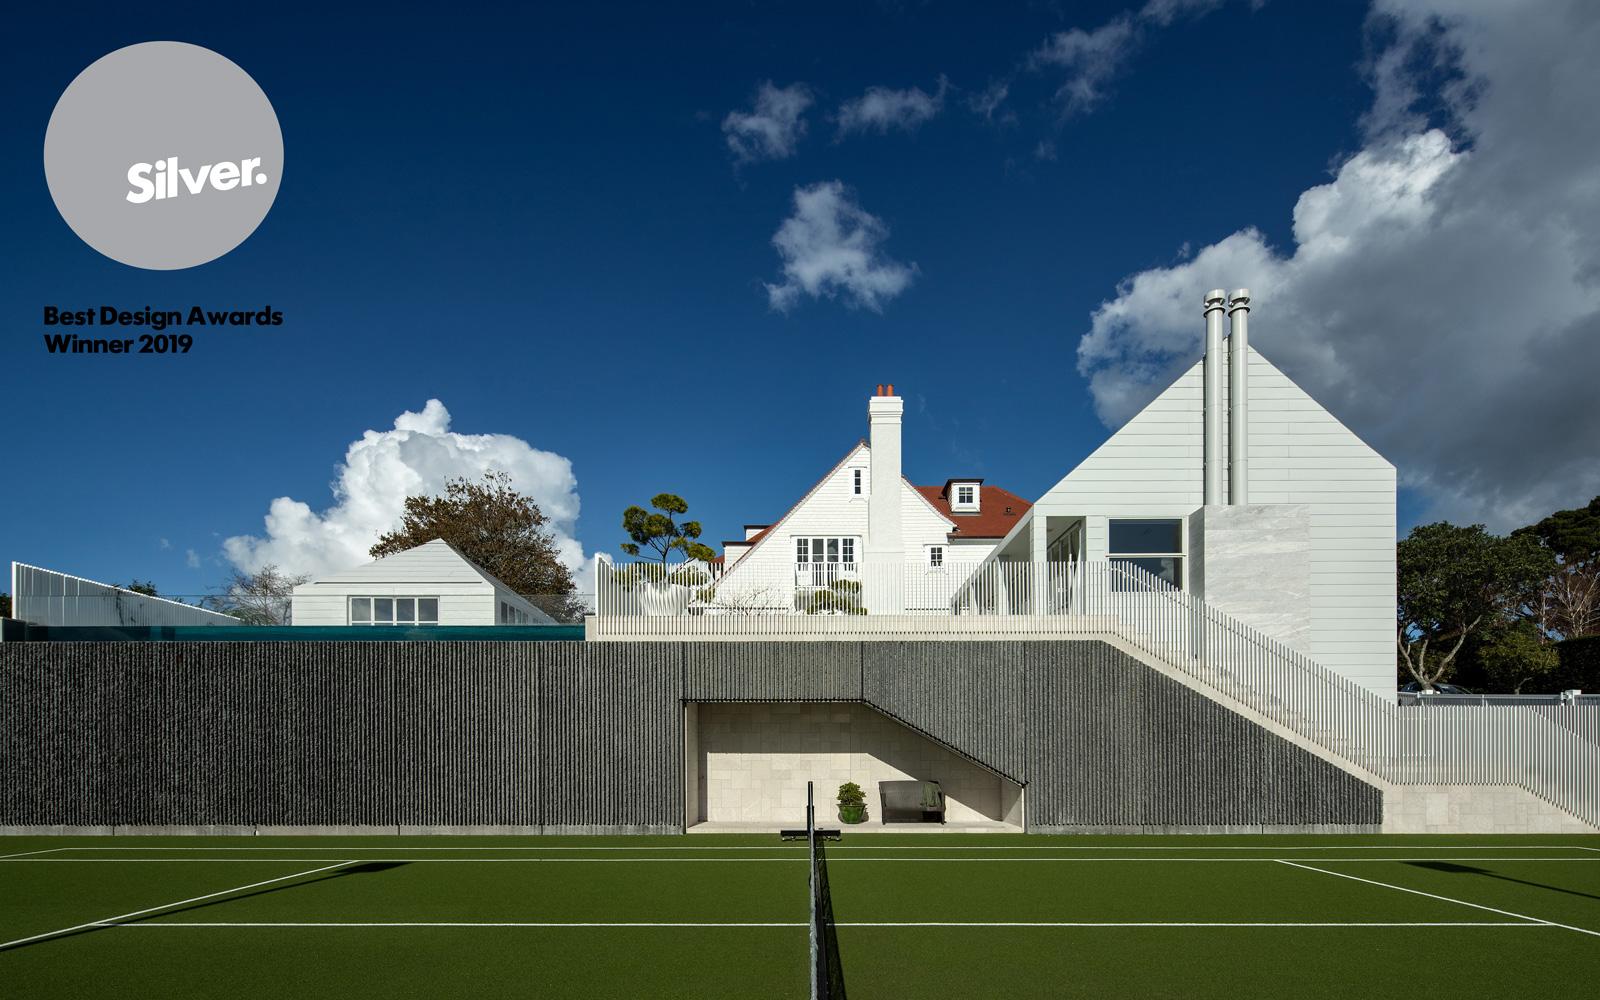 Recrafted Art House winner of Silver Best Award